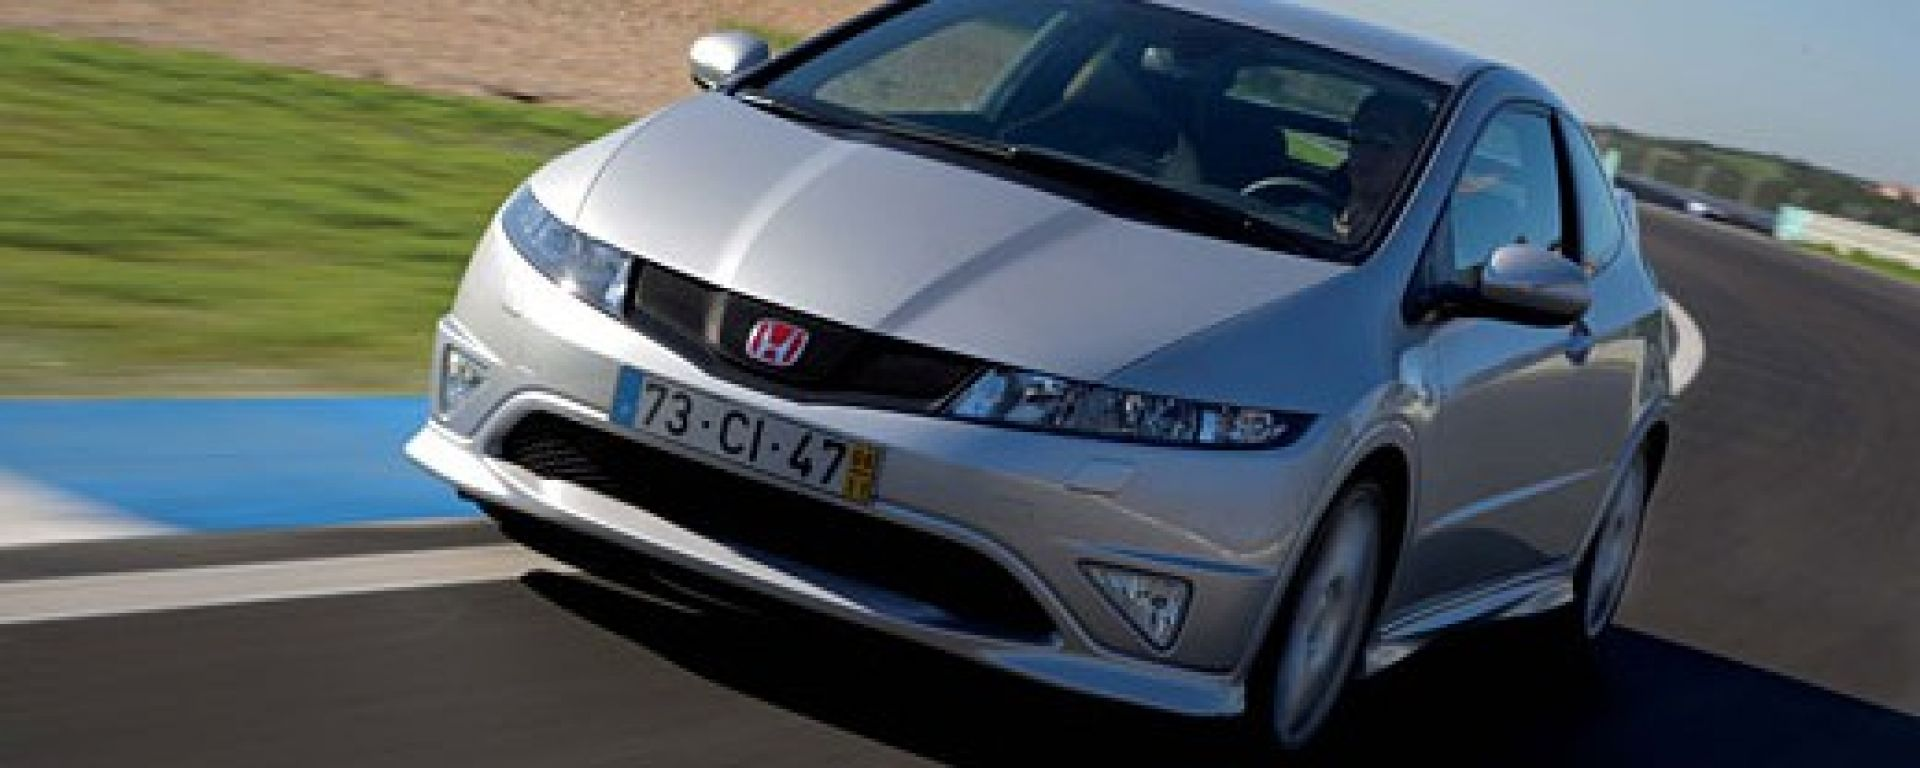 Honda Civic Type-R e Type-S